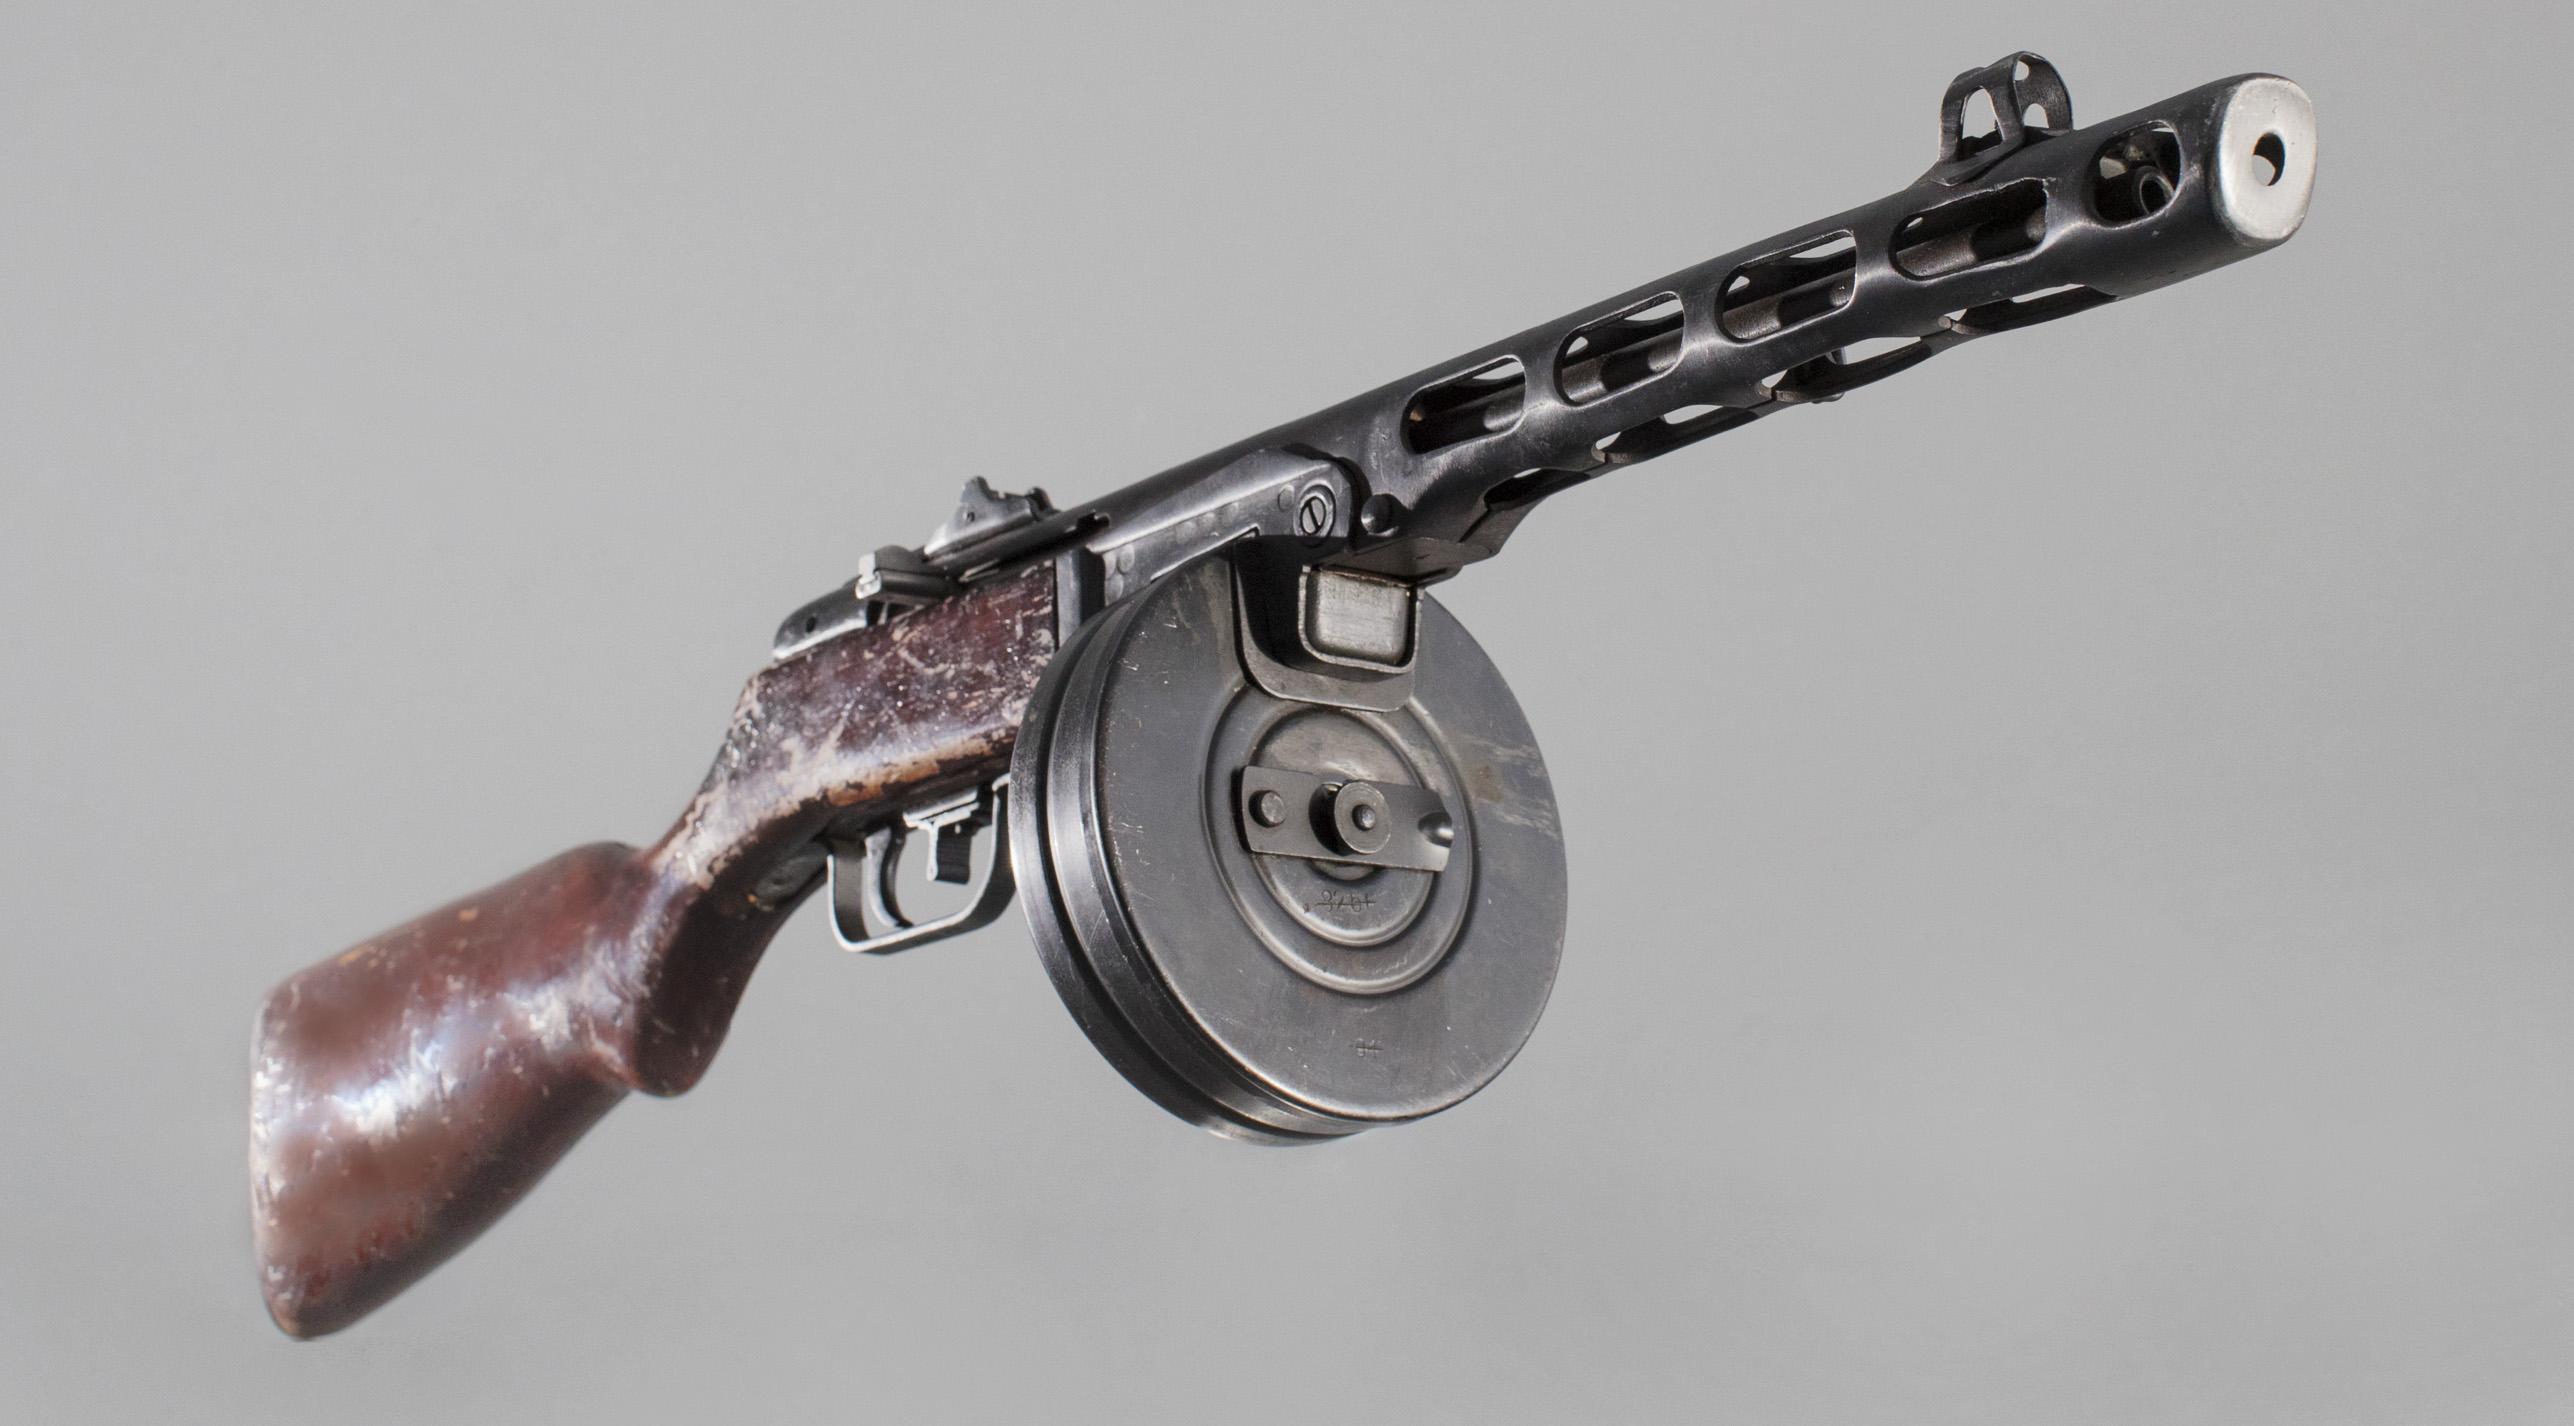 100 лет «Красной Армии»: Пистолет-пулемет Шпагина ППШ-41 ...